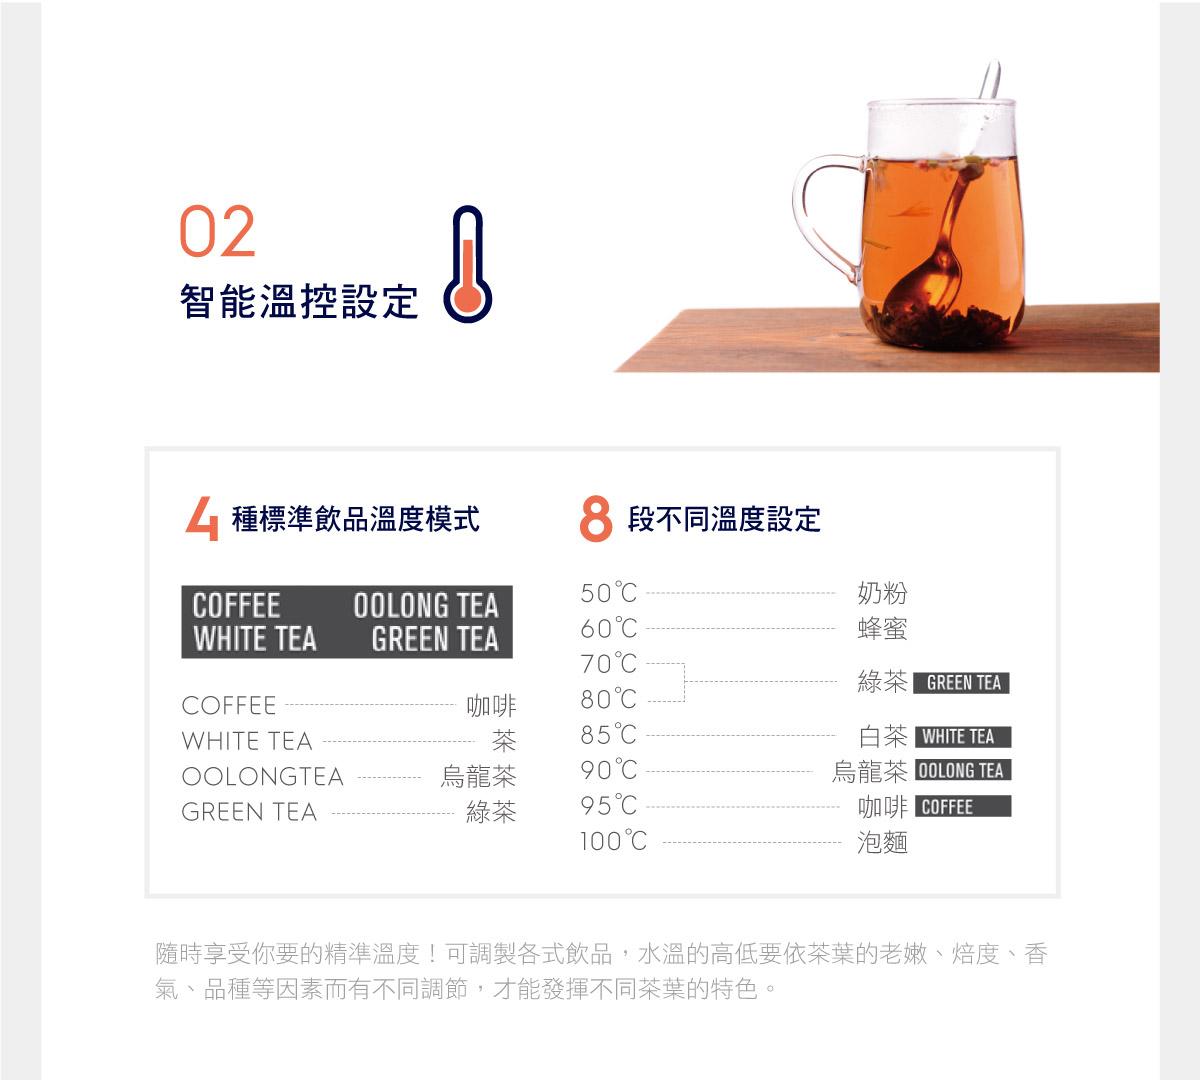 COSTCO官網線上代購宅配免運~伊萊克斯溫控電茶壺 1.7L (EEK7814CH)